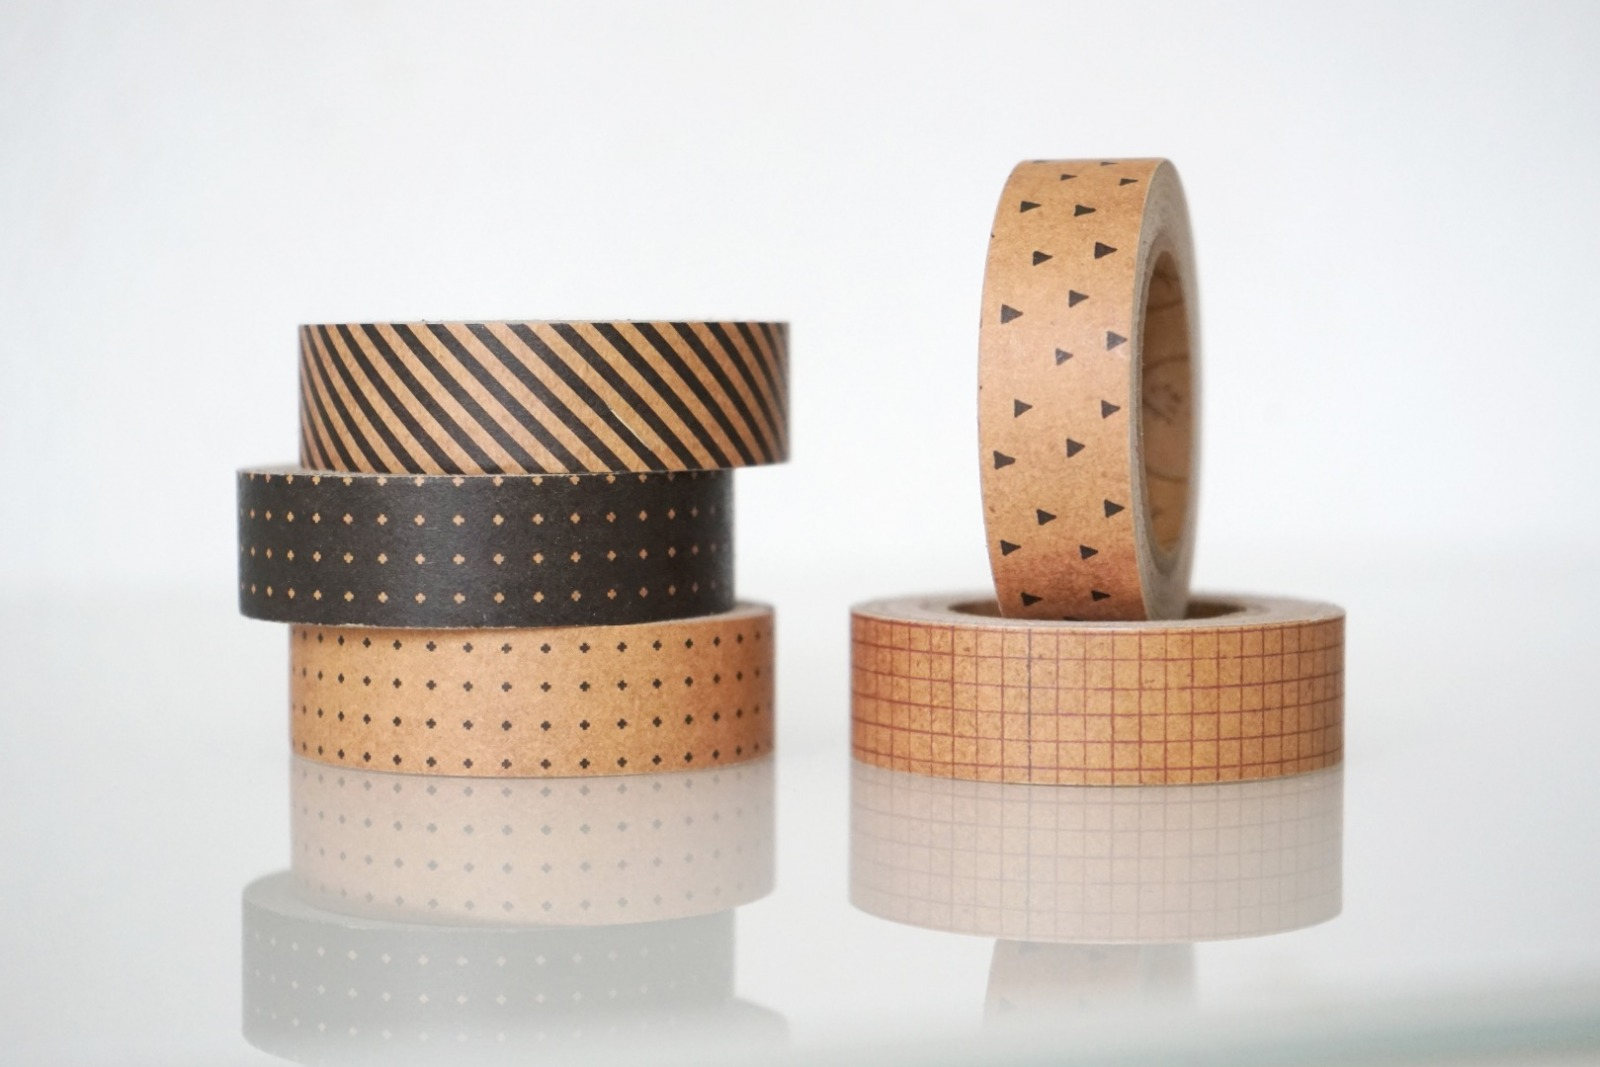 Klebeband Kraftpapier geometrische Muster